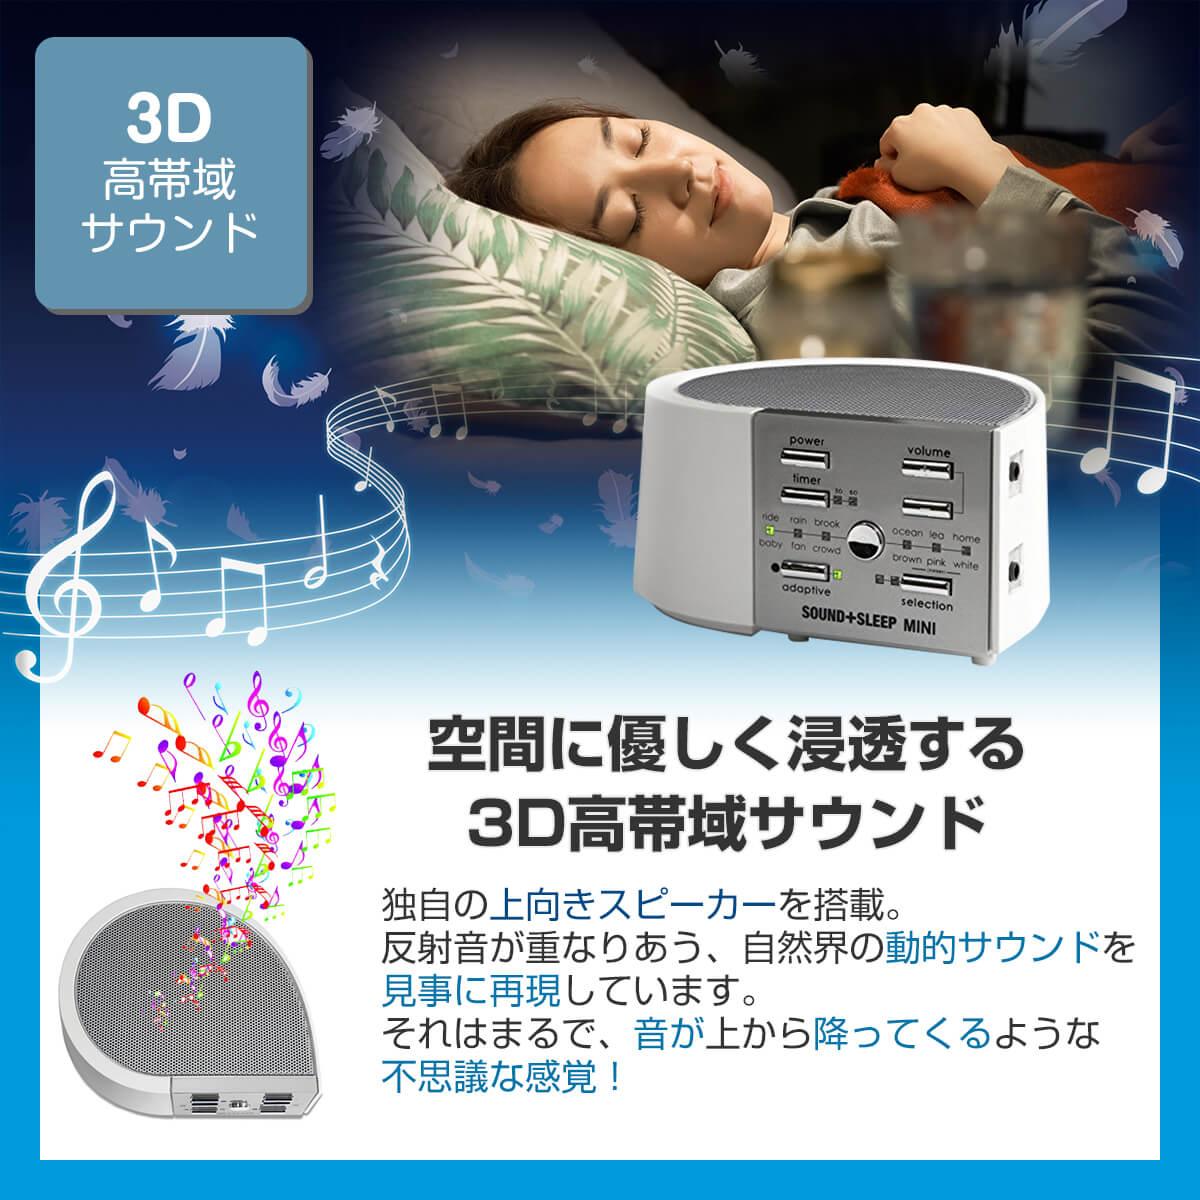 3D高帯域サウンド